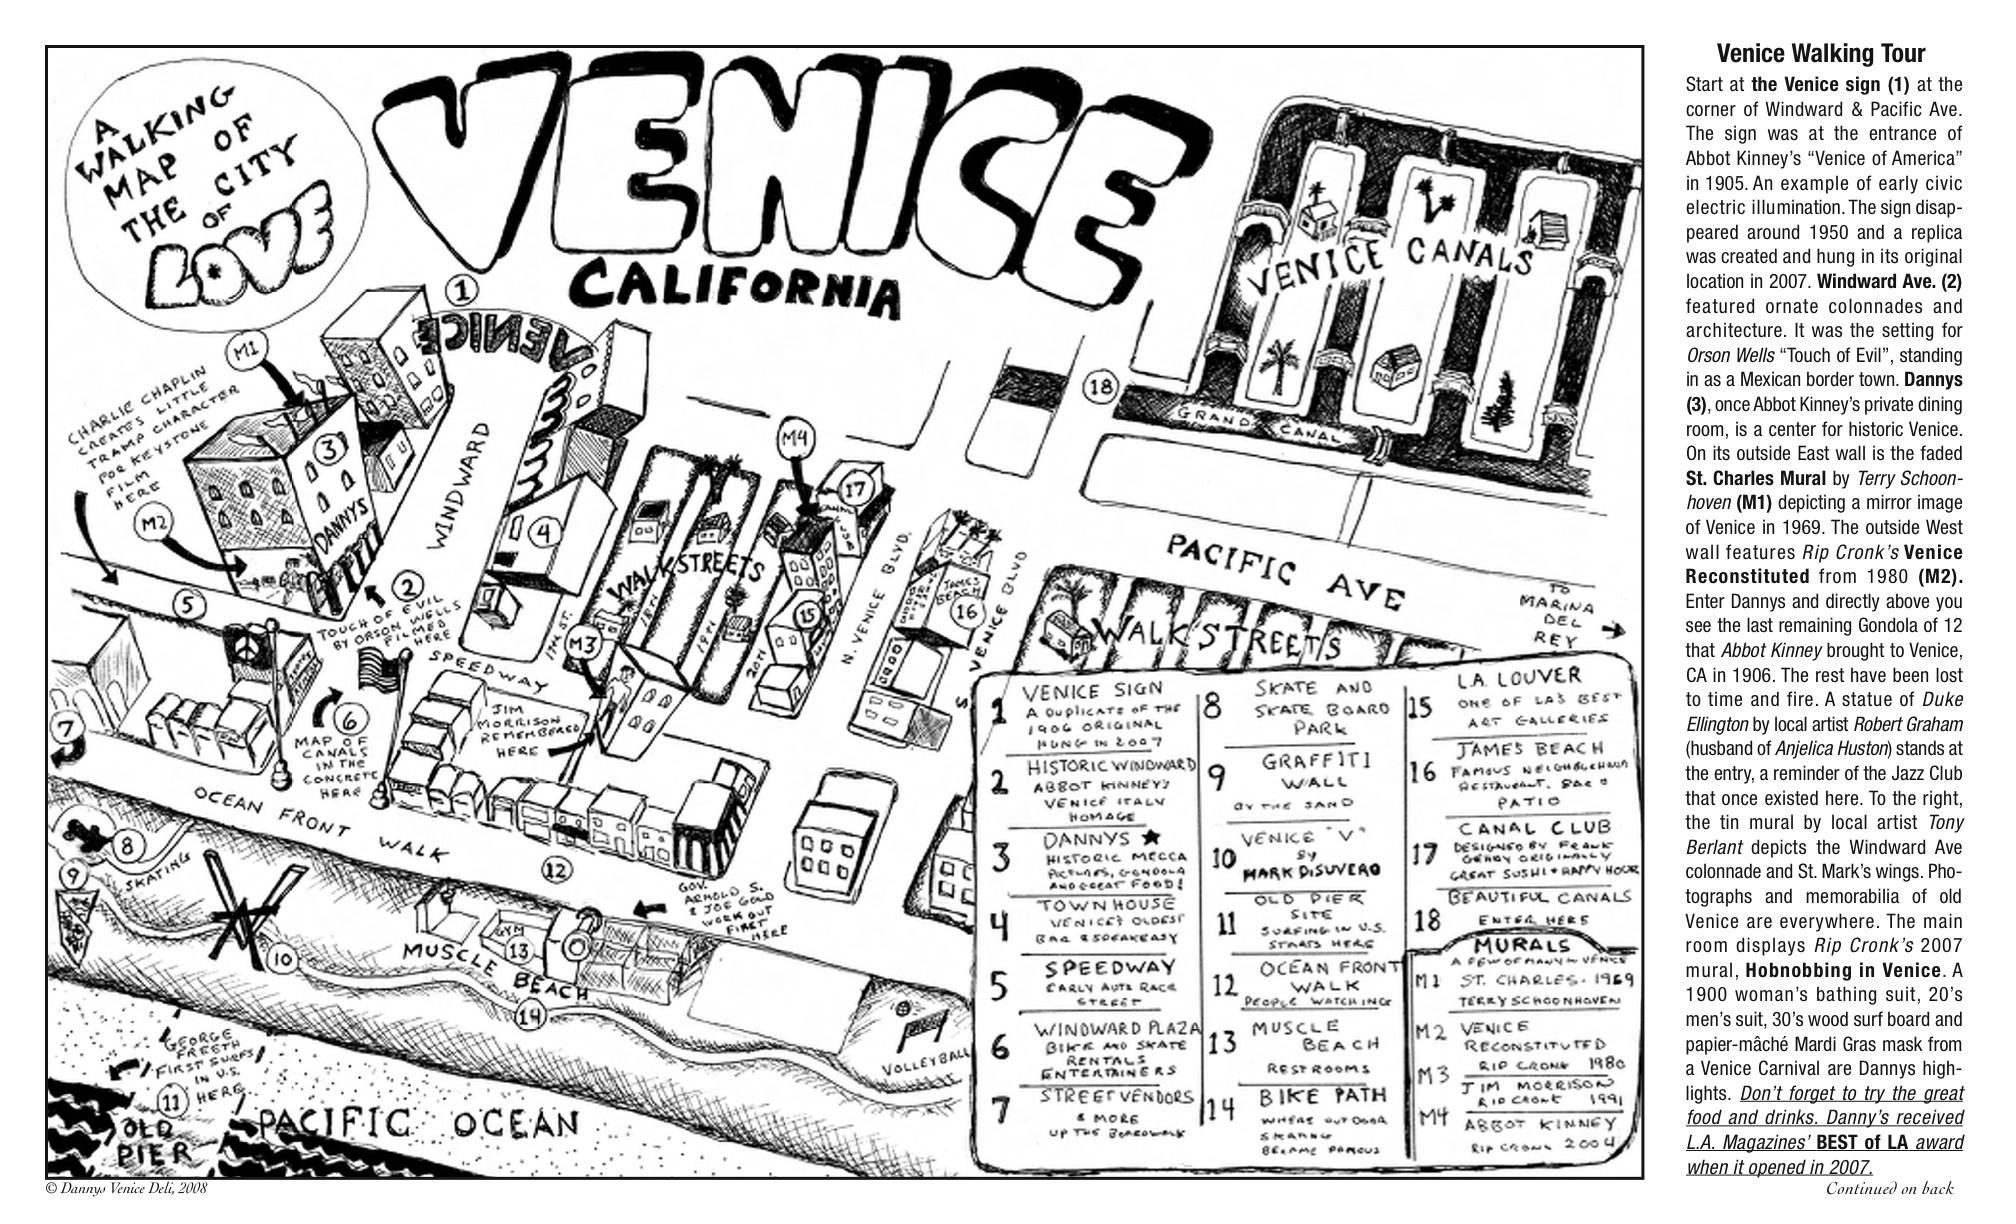 Map Of Venice Beach California - Klipy - Map Of Venice California Area